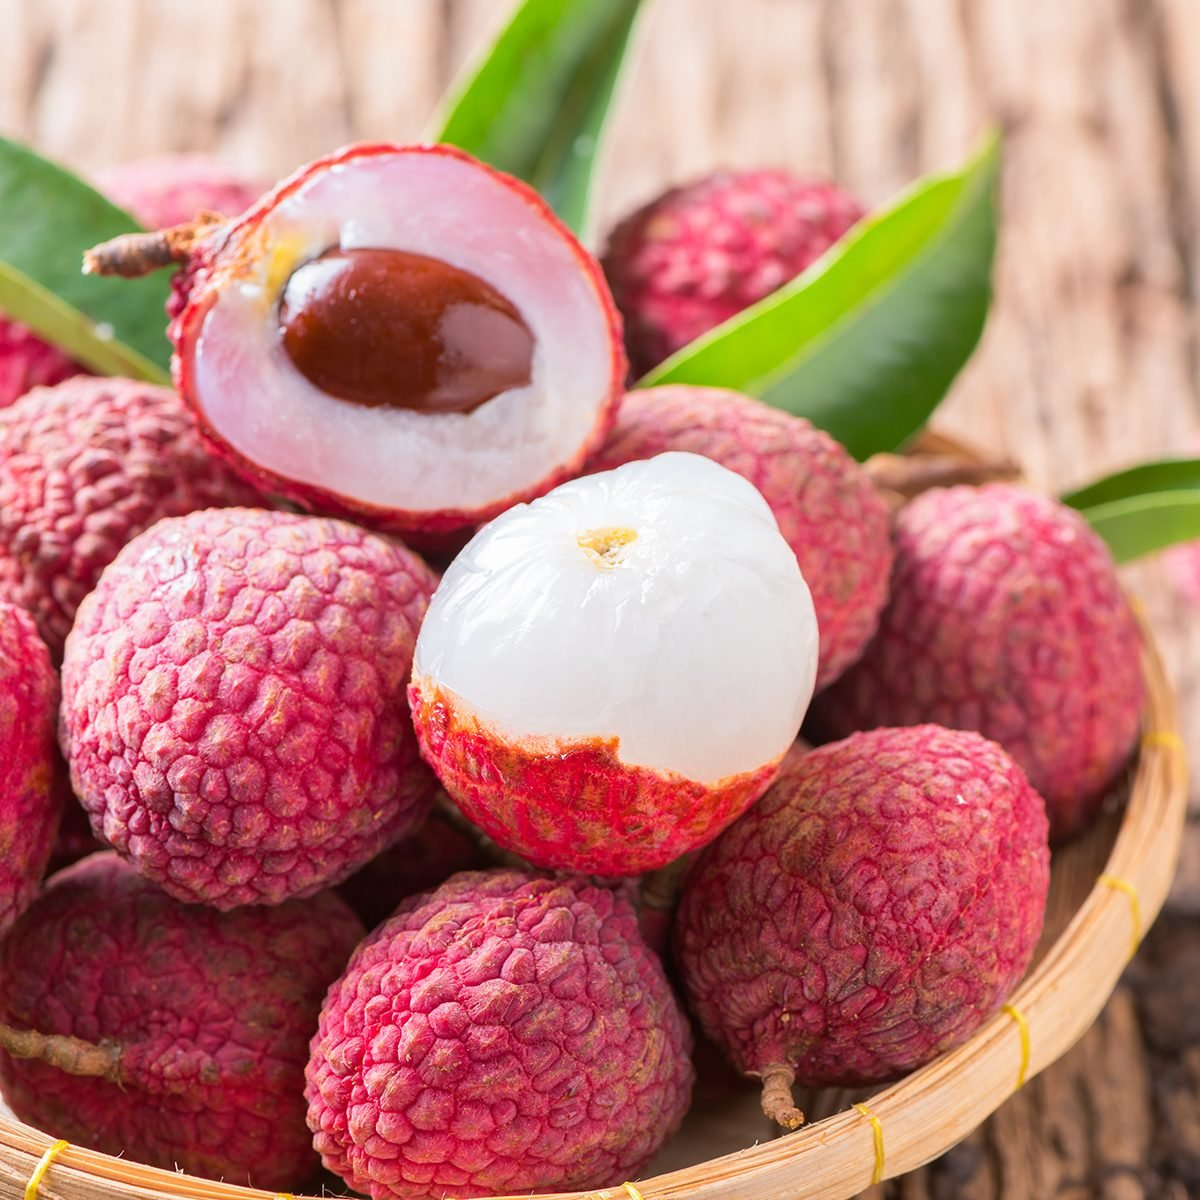 fresh-organic-lychee-fruit-shutterstock_671425801